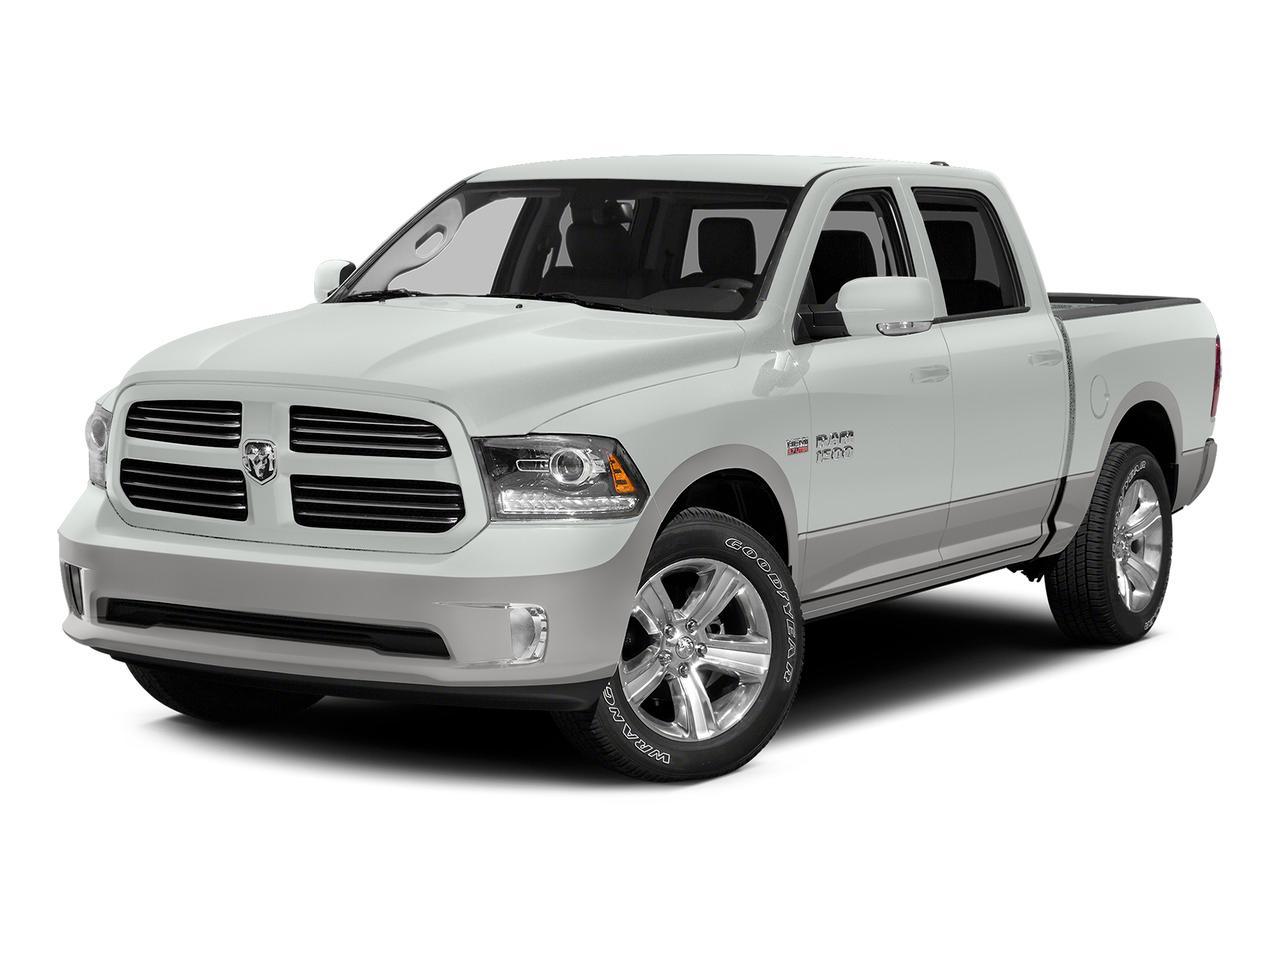 2015 Ram 1500 Vehicle Photo in San Antonio, TX 78254